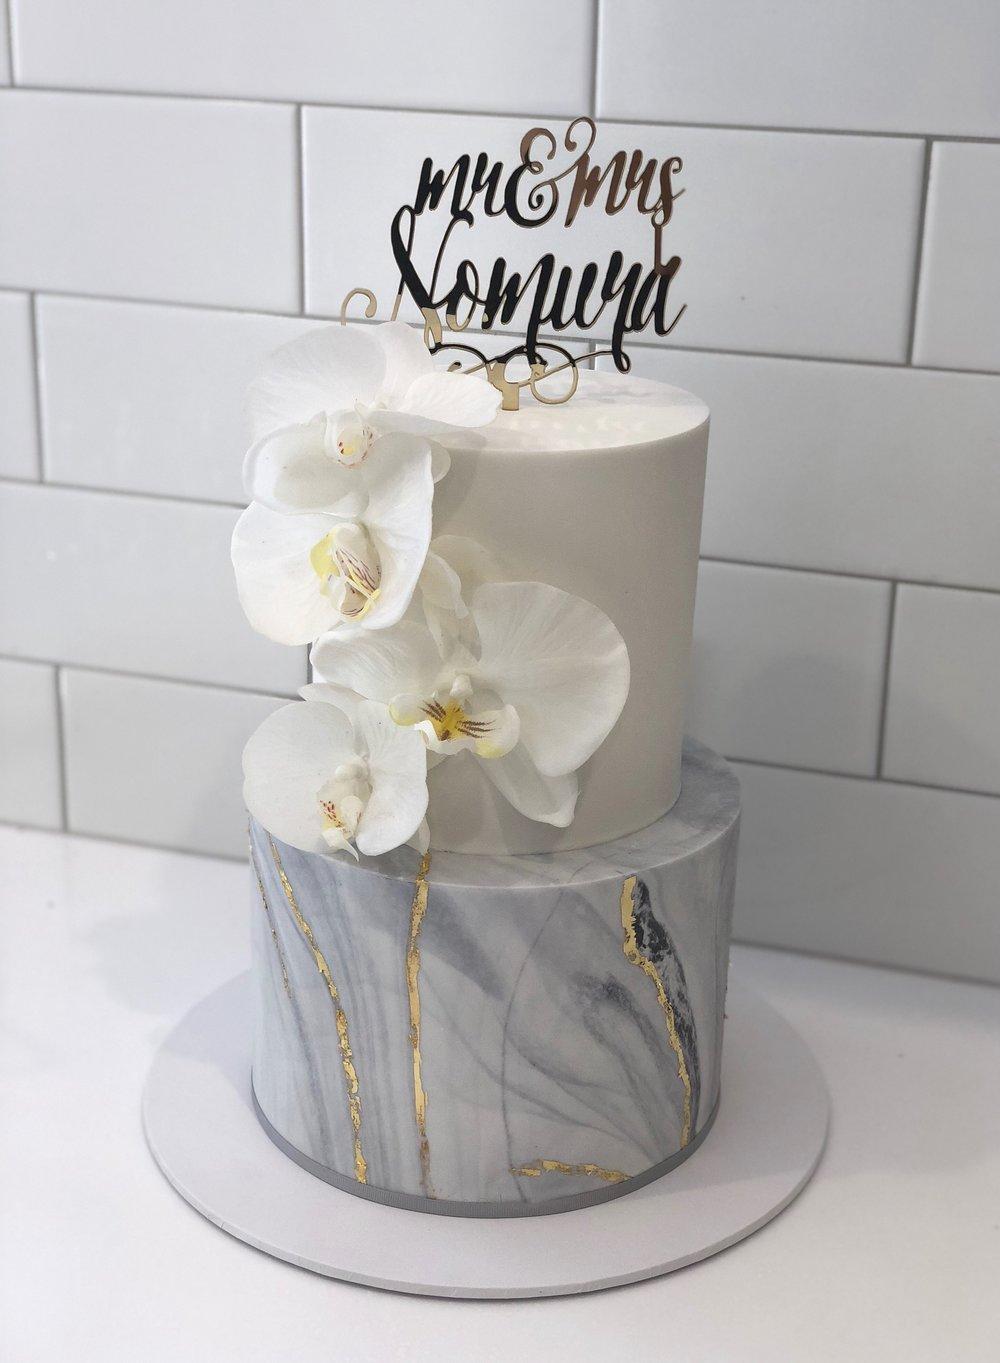 Marble Fondant Cake